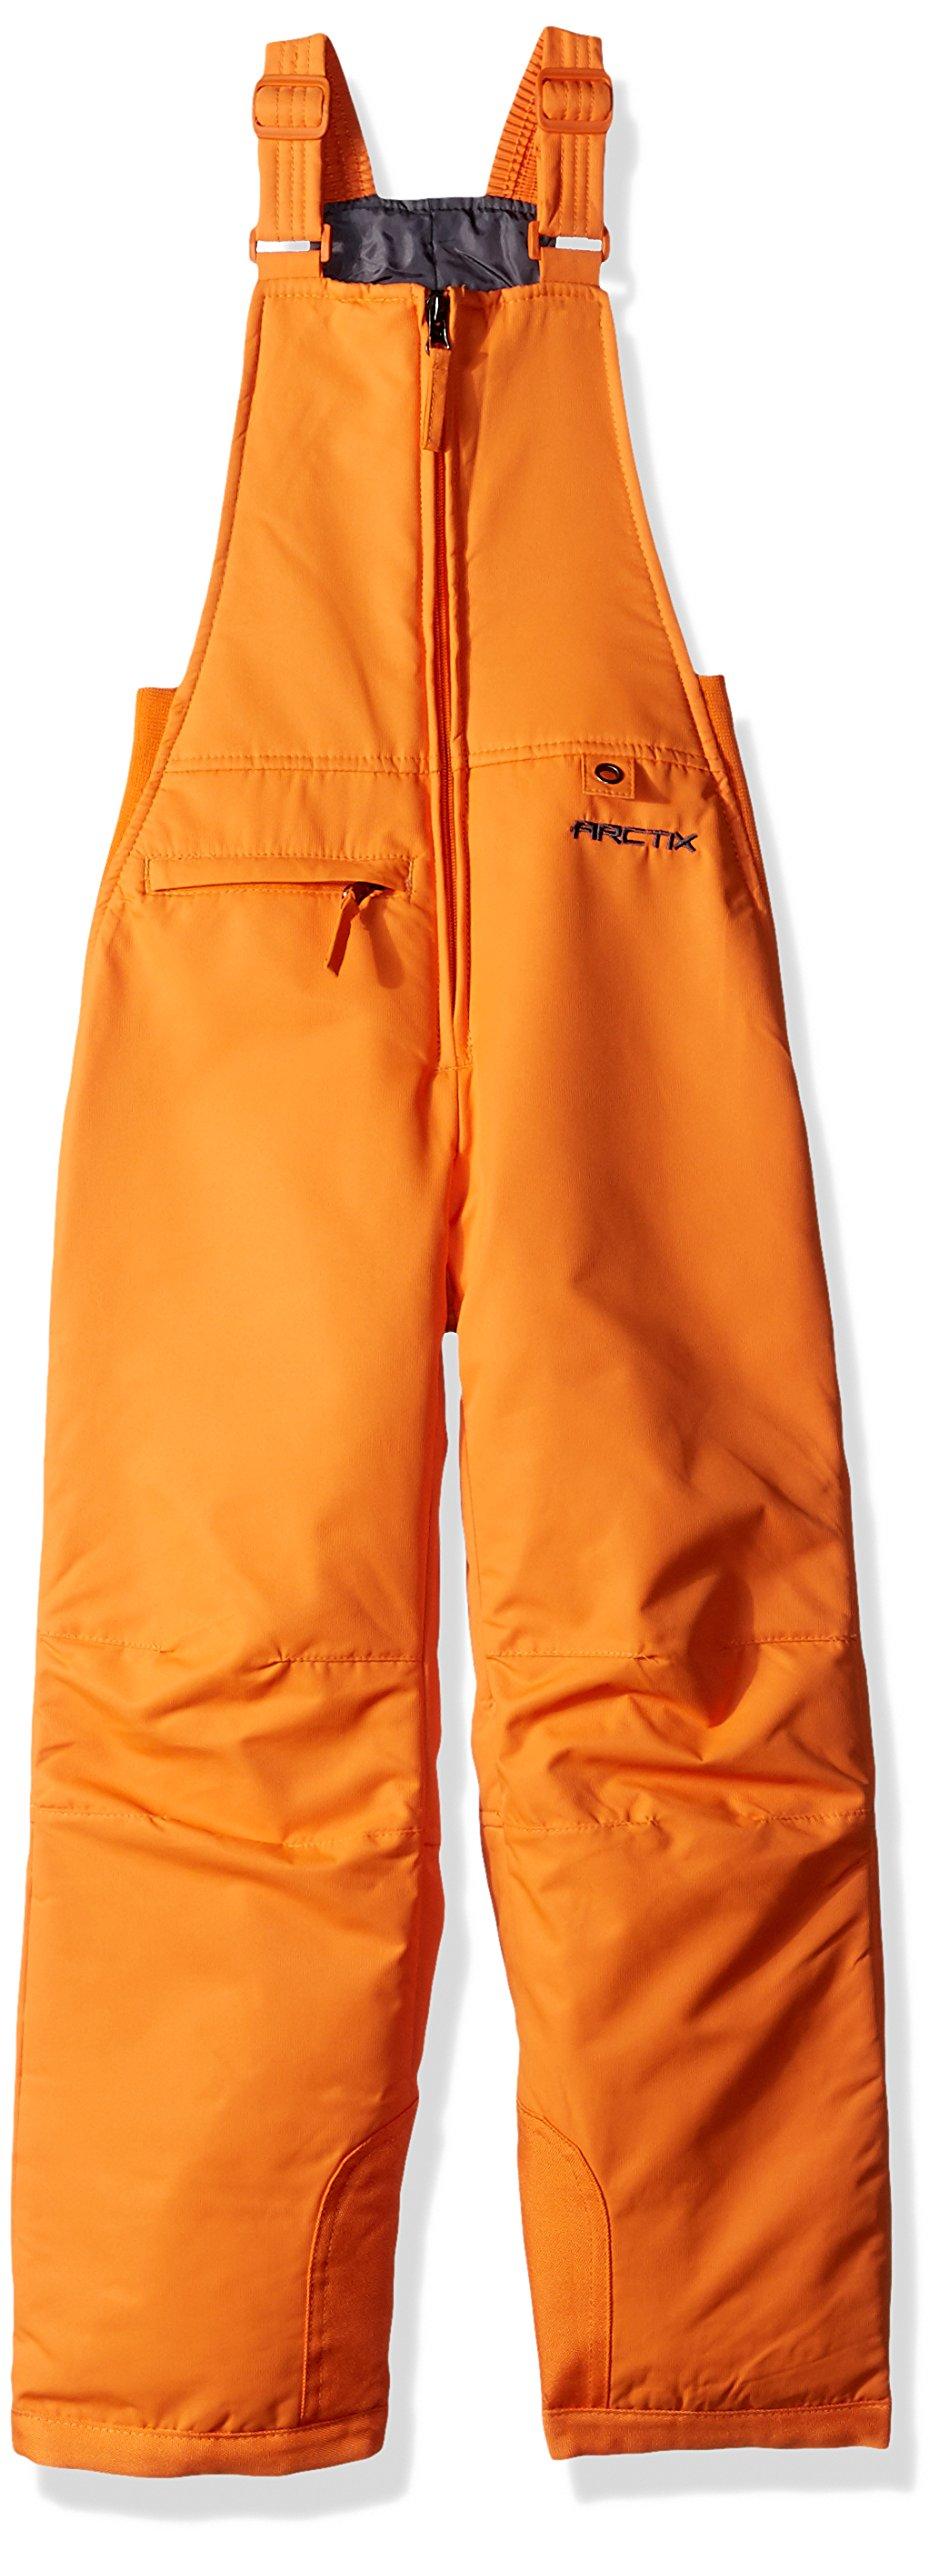 Arctix Youth Insulated Overall Snow Bib, Burnt Orange, Small